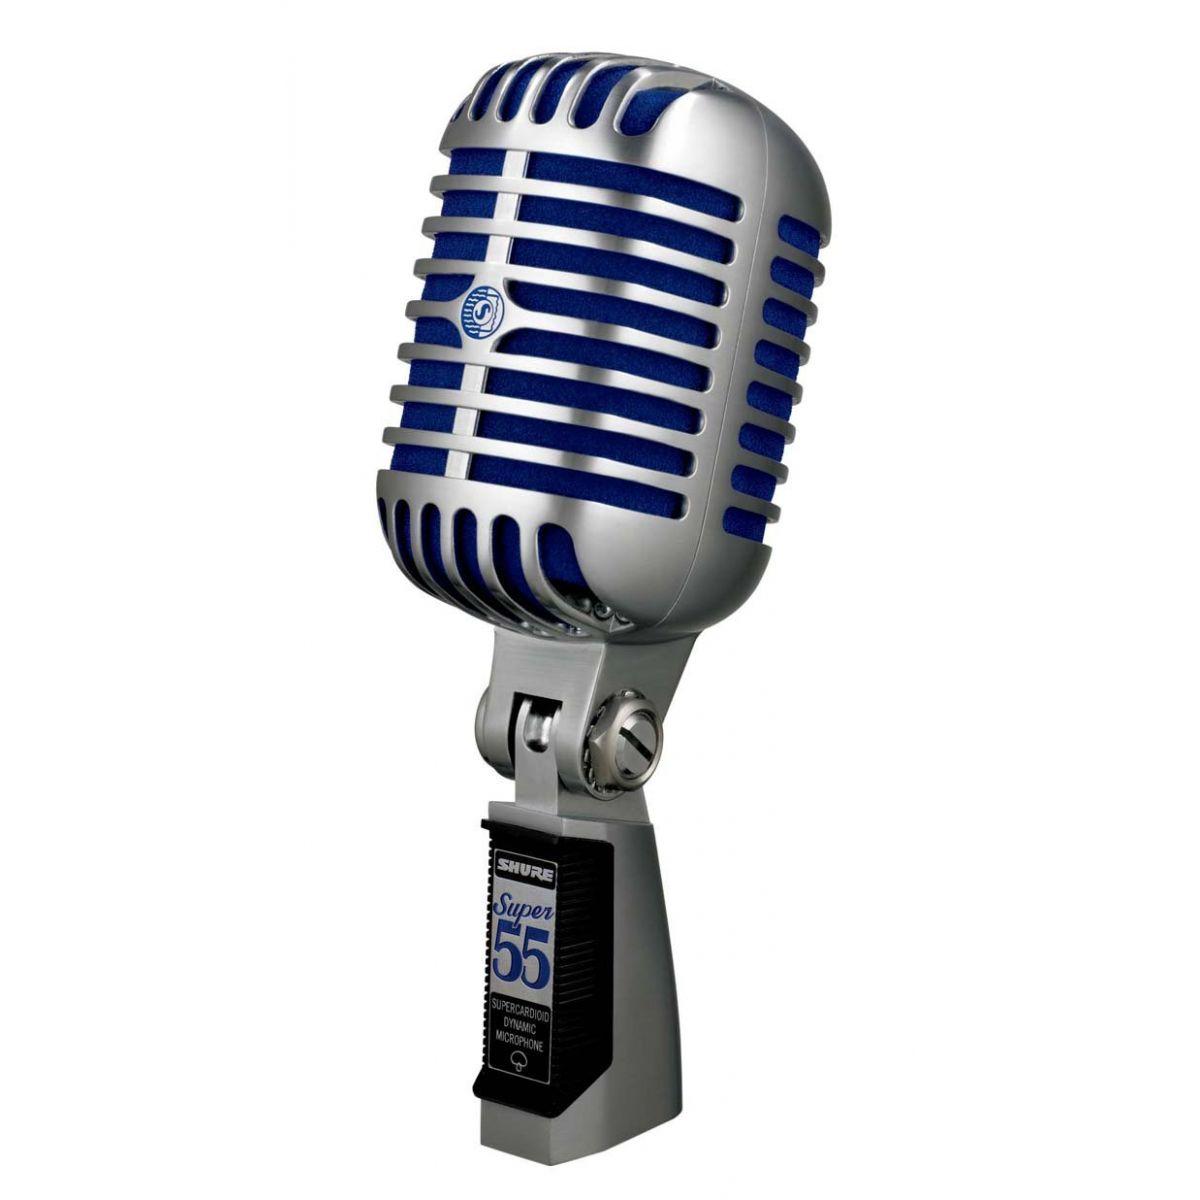 Microfone Shure Super 55 Vintage